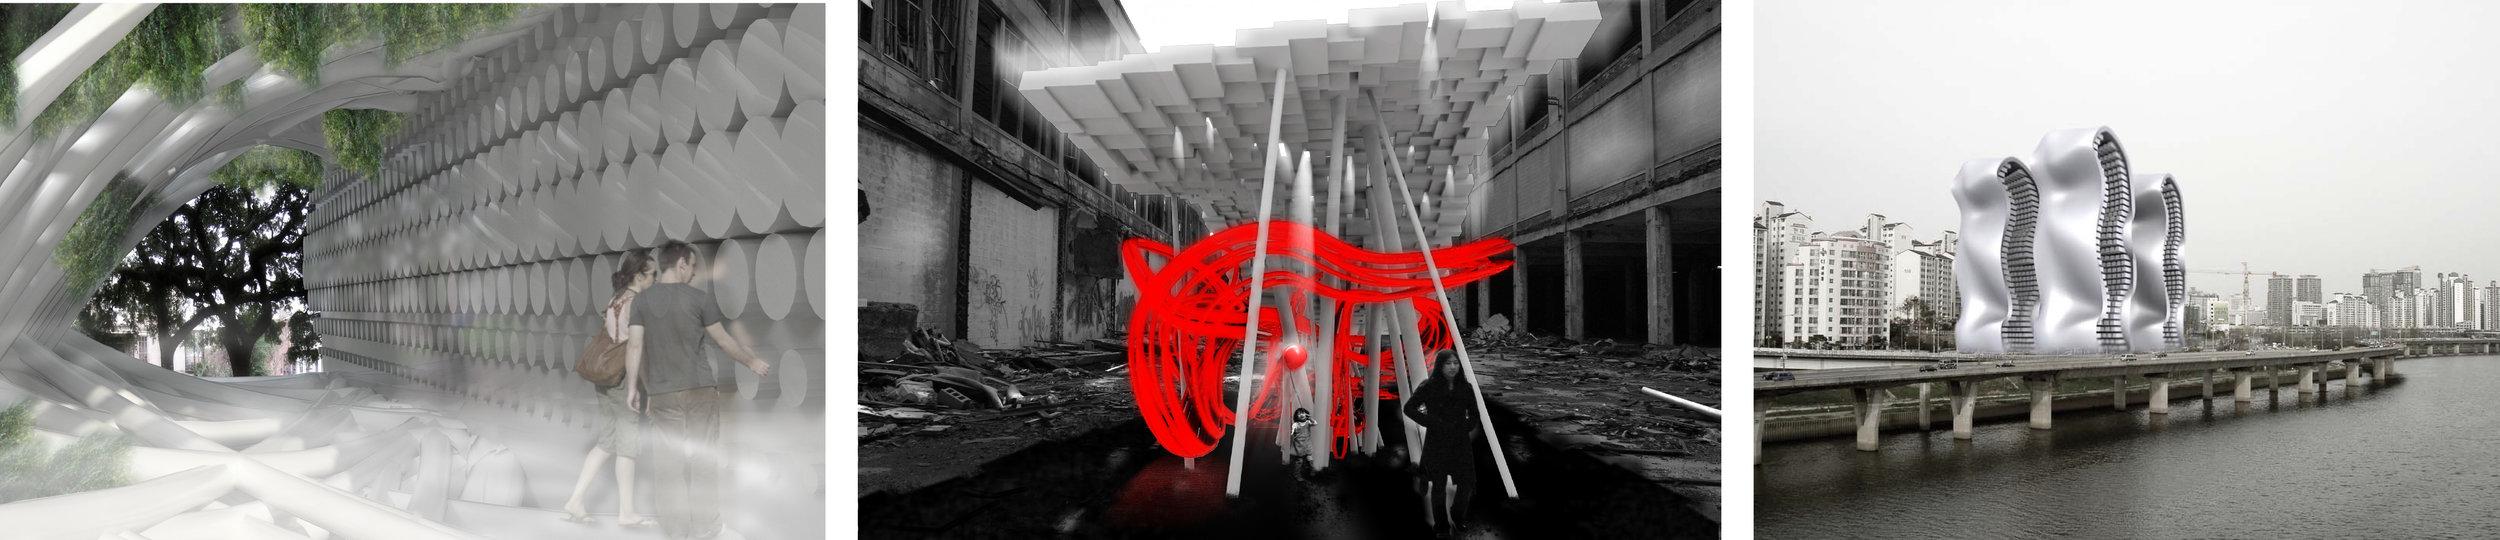 Locus_Gallery_Place_Facade_7.jpg